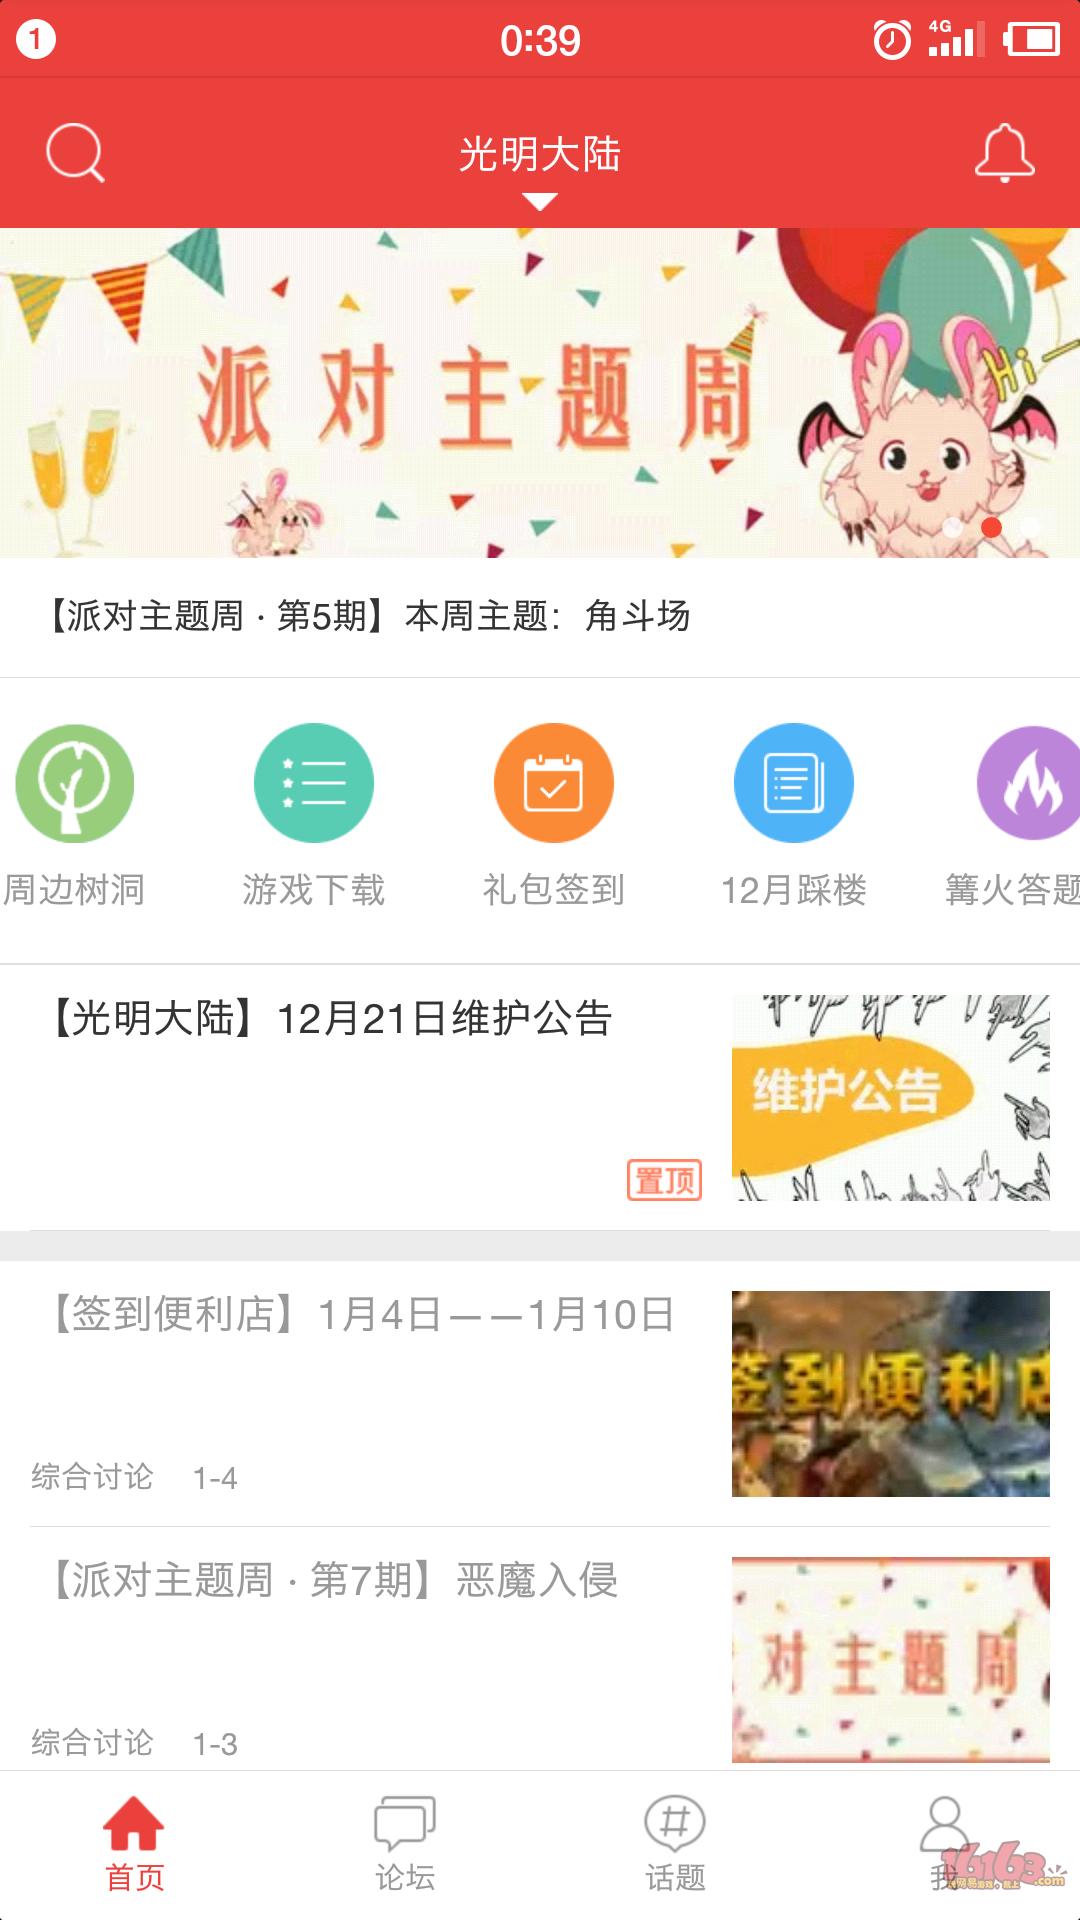 Screenshot_2018-02-03-00-39-20-690_缃戞槗娓告垙璁哄潧.png